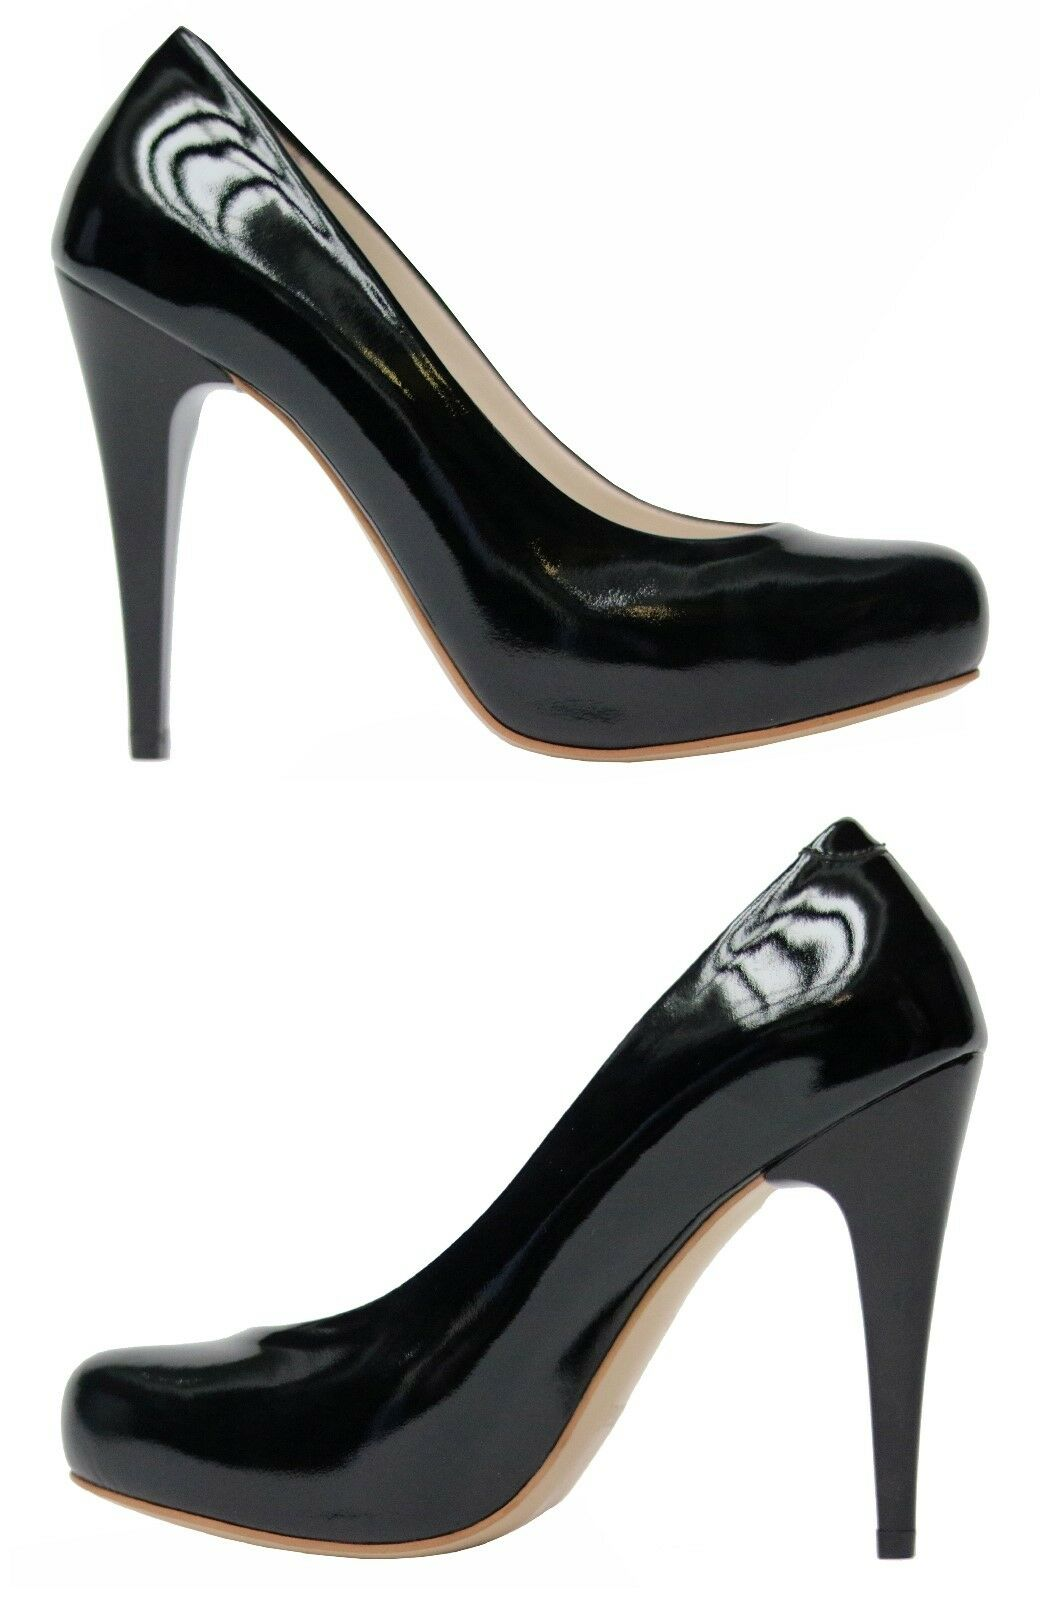 Muga Damen Schuhe Pumps Gr.40 Schwarz